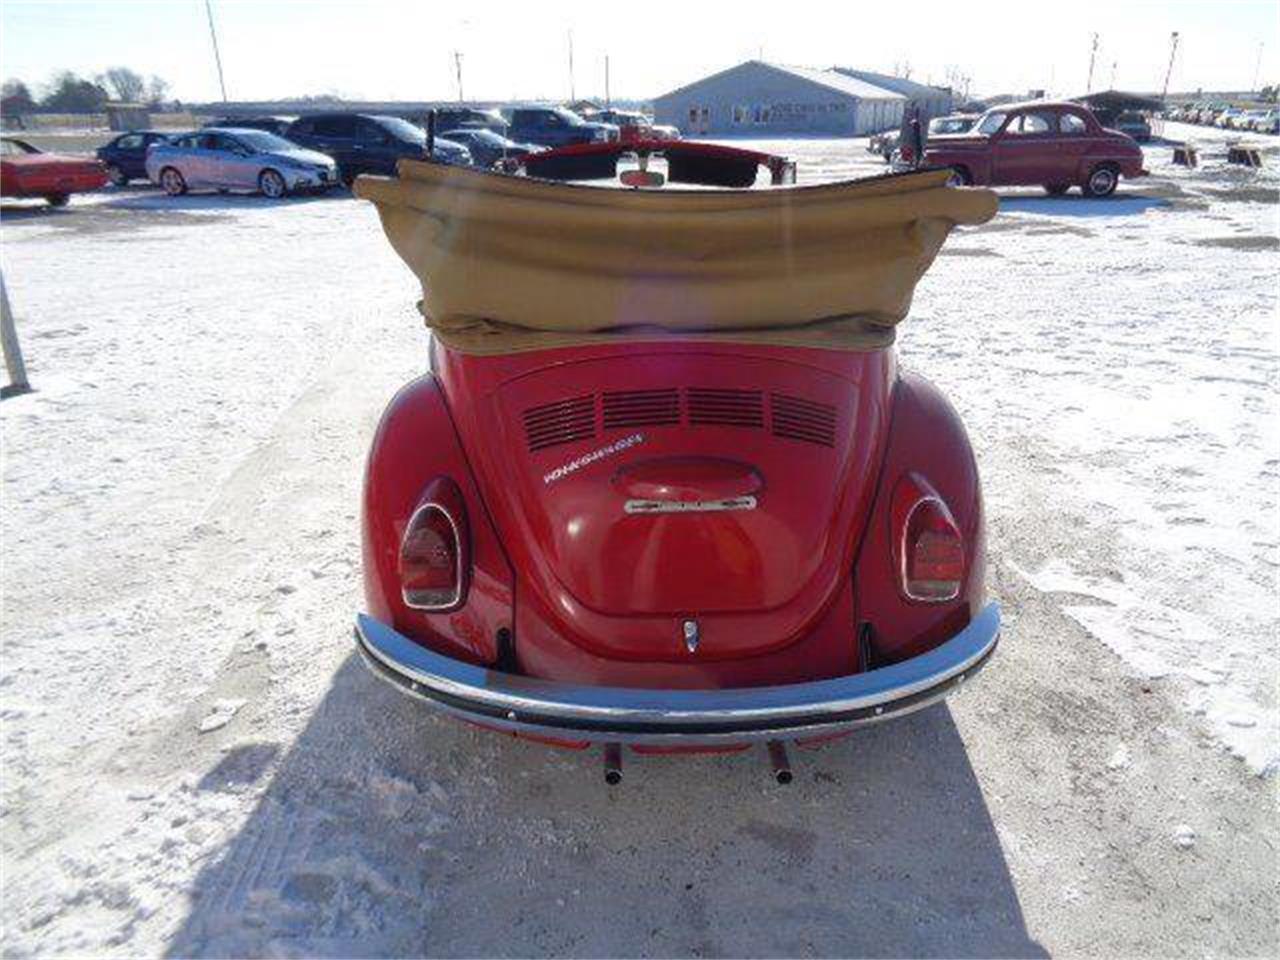 1969 Volkswagen Beetle (CC-1059585) for sale in Staunton, Illinois